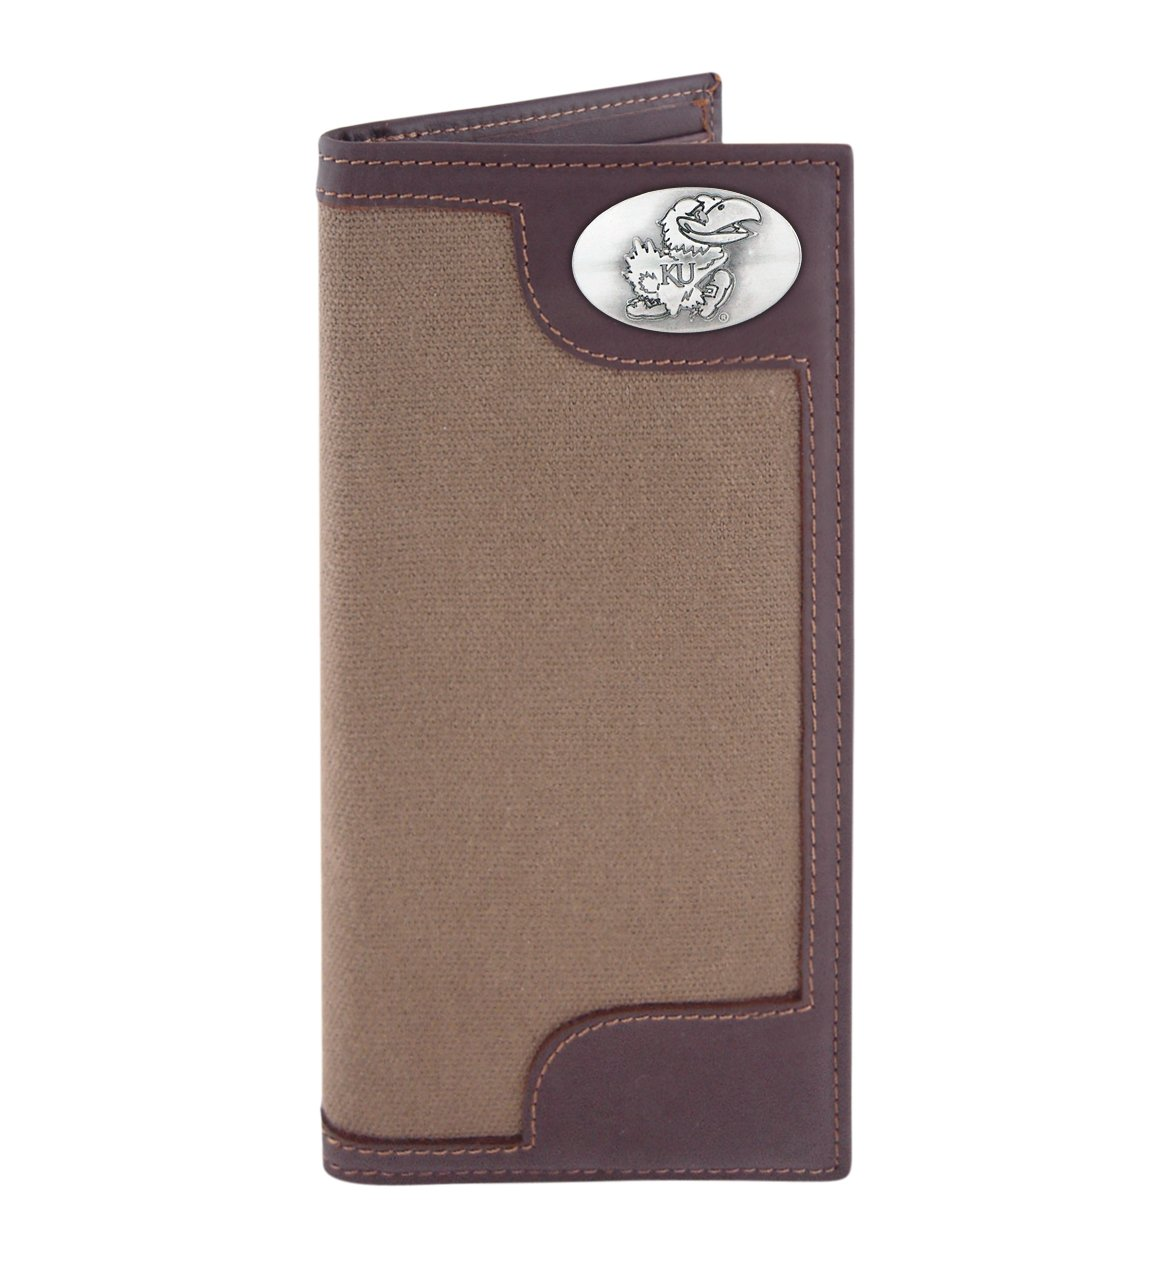 ZEP-PRO NCAA Canvas Leather Concho Secretary Wallet Olive